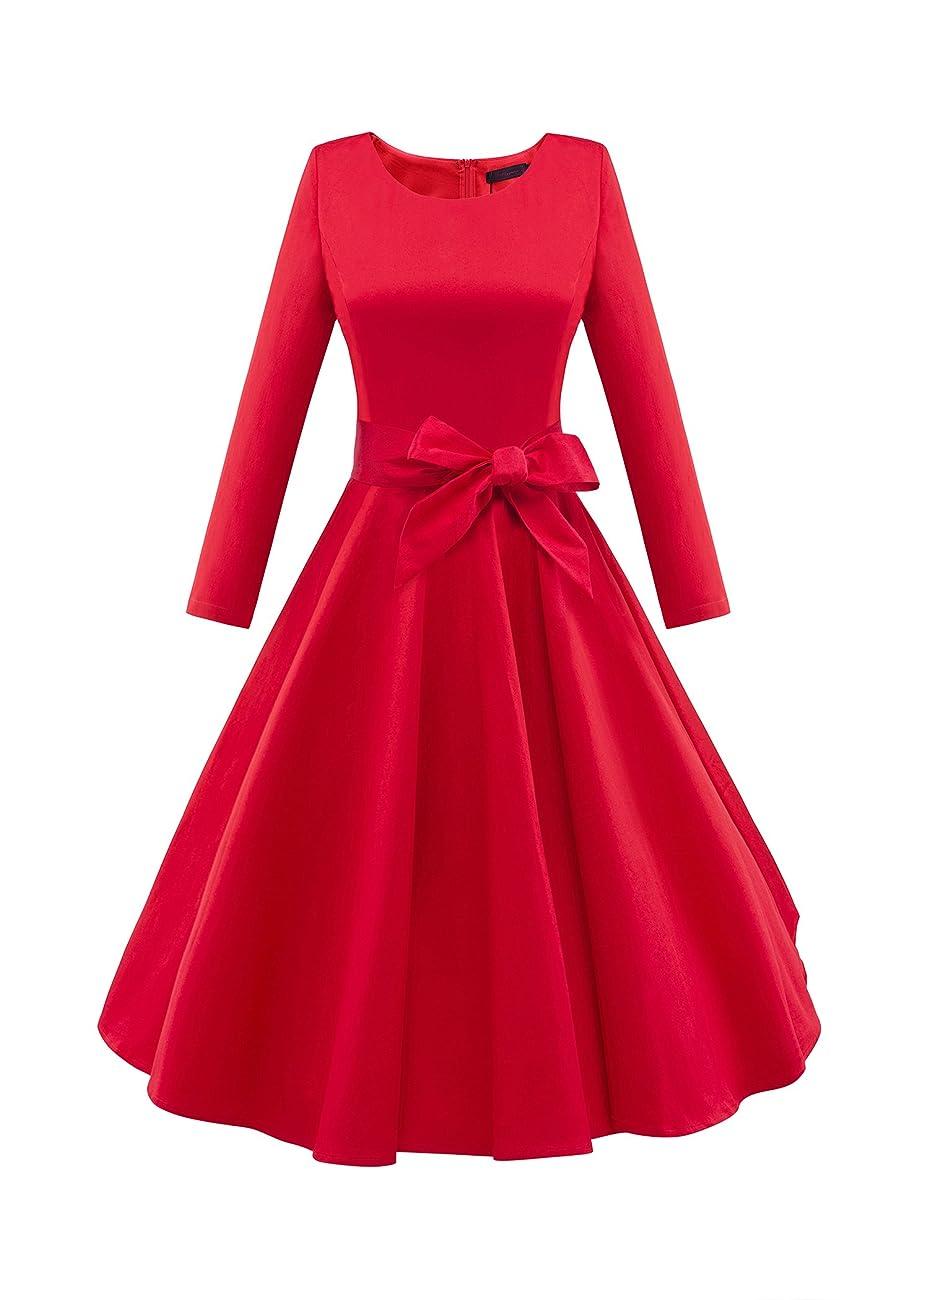 LUOUSE Audrey Hepburn 3/4 Sleeve 1950s Vintage Rockabilly Dress 0